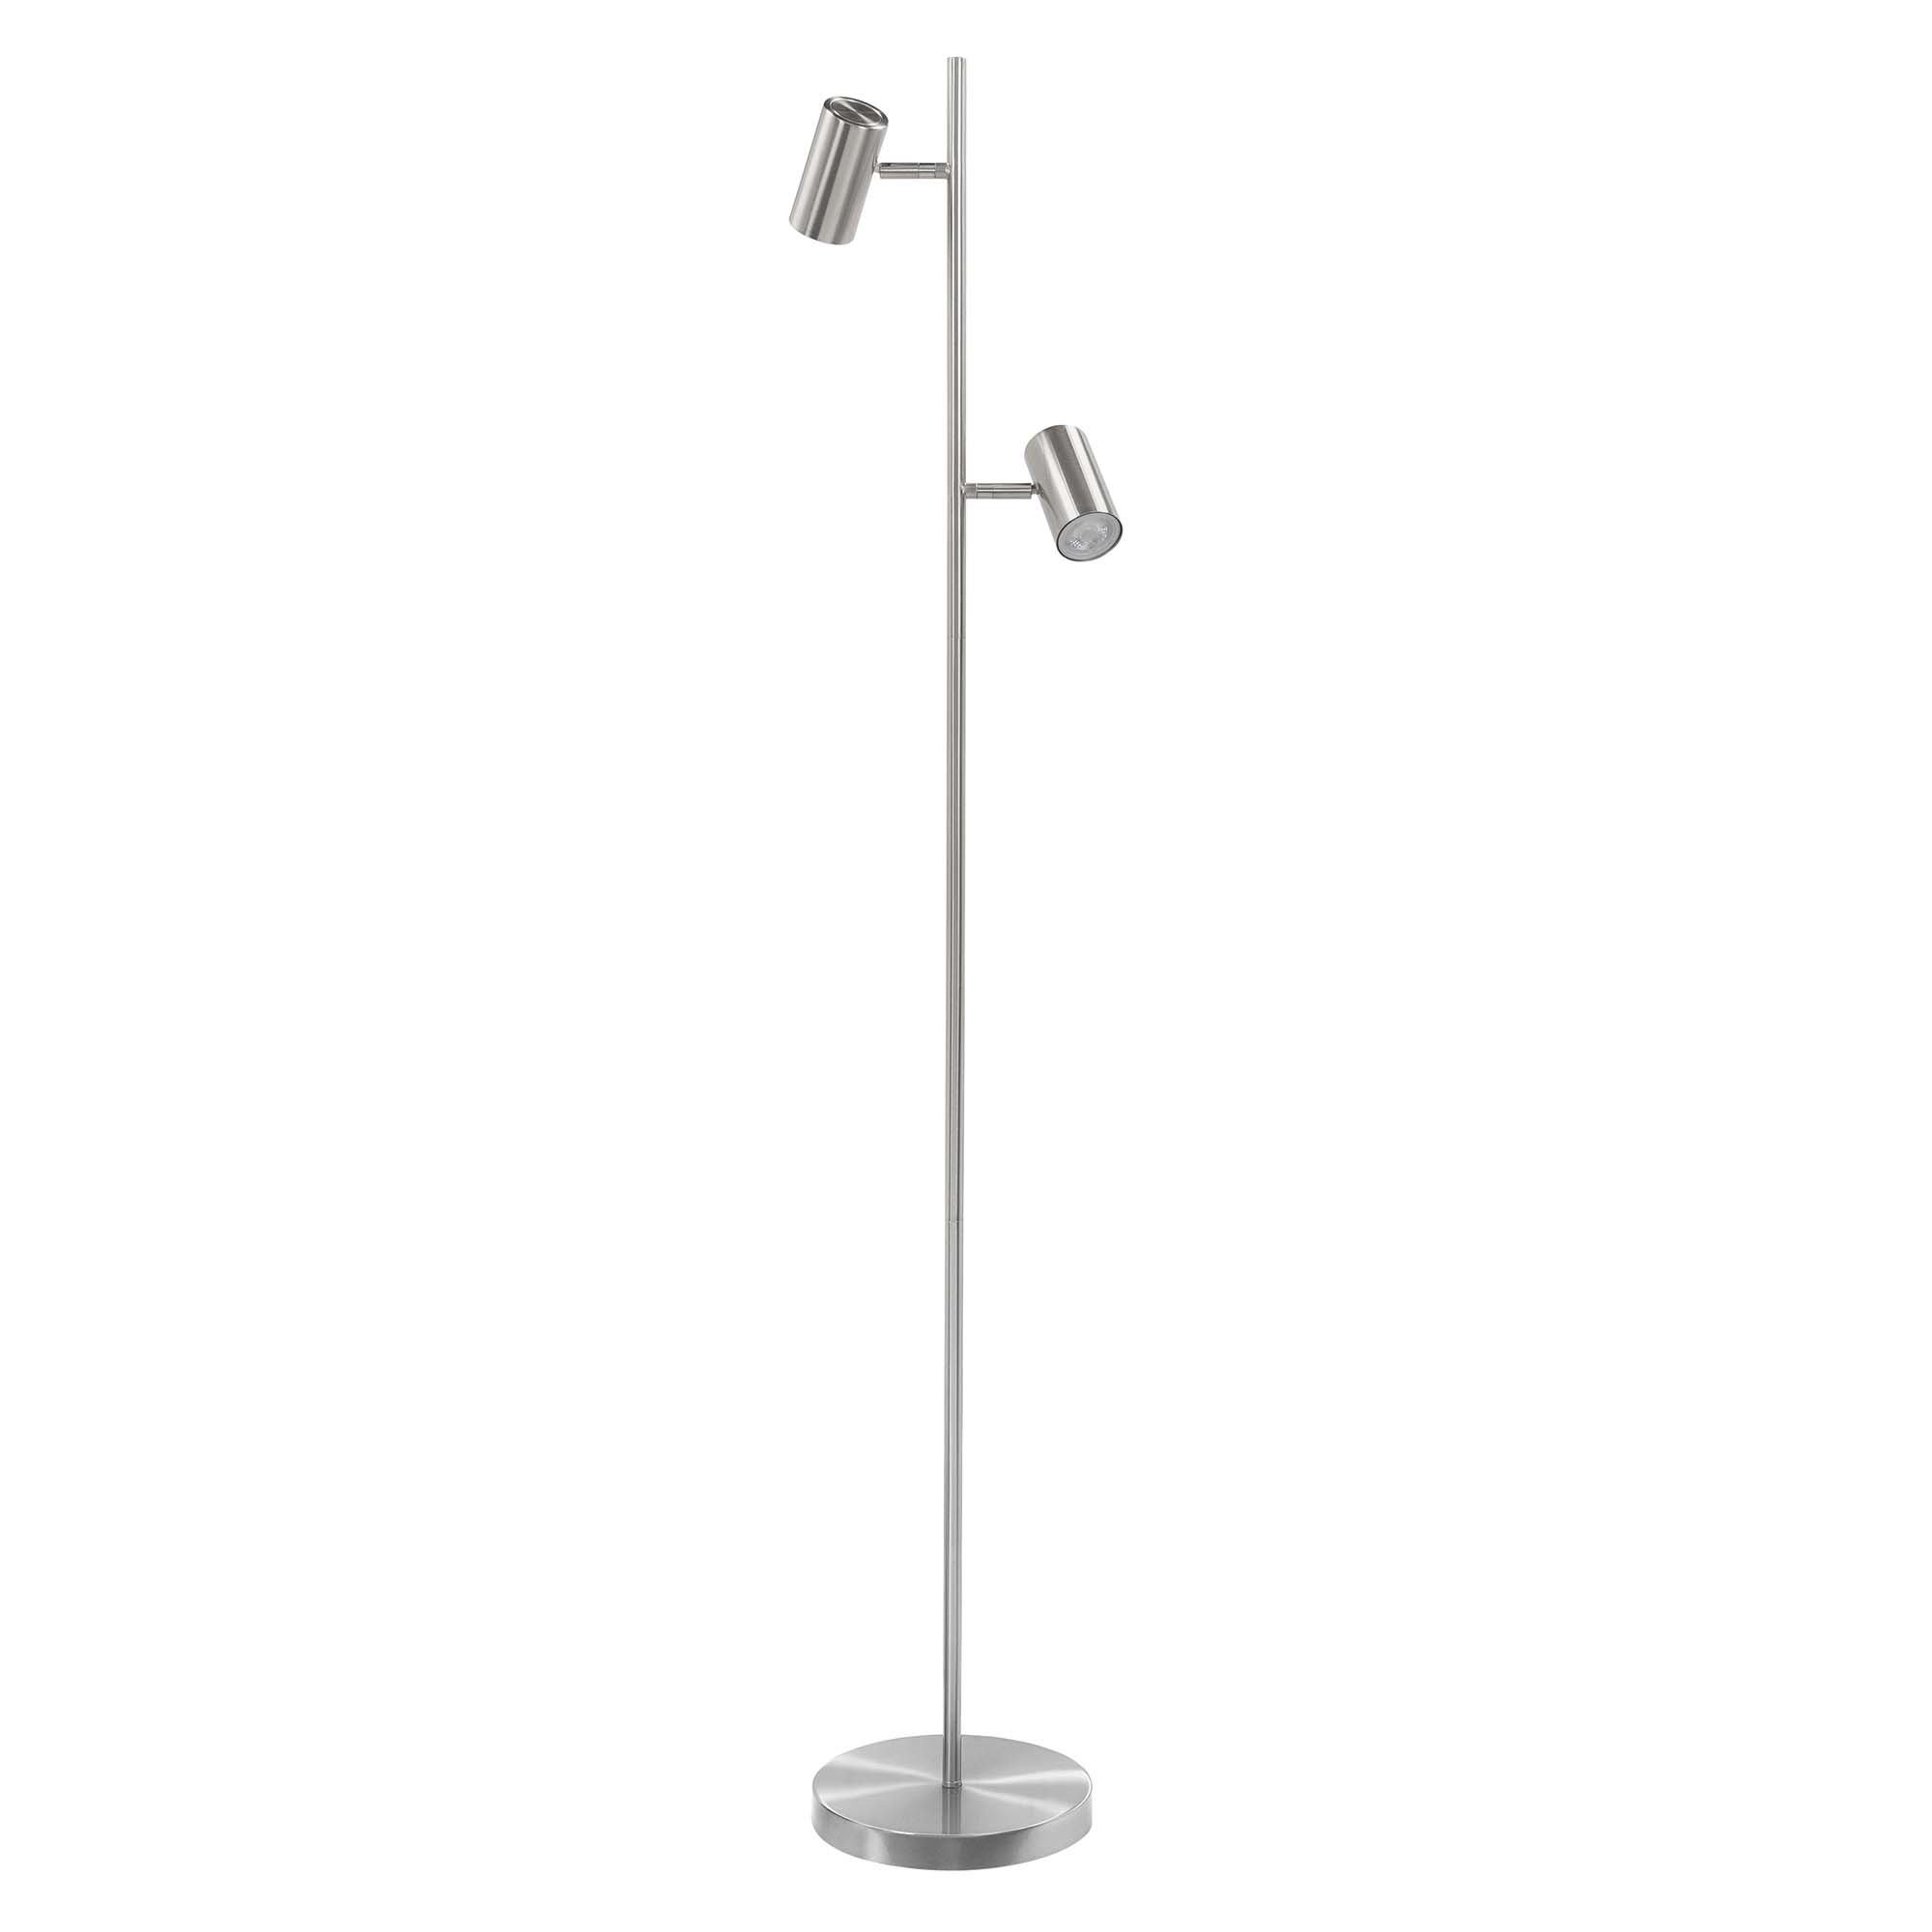 Highlight Vloerlamp Burgos 2 lichts H 142 cm mat chroom